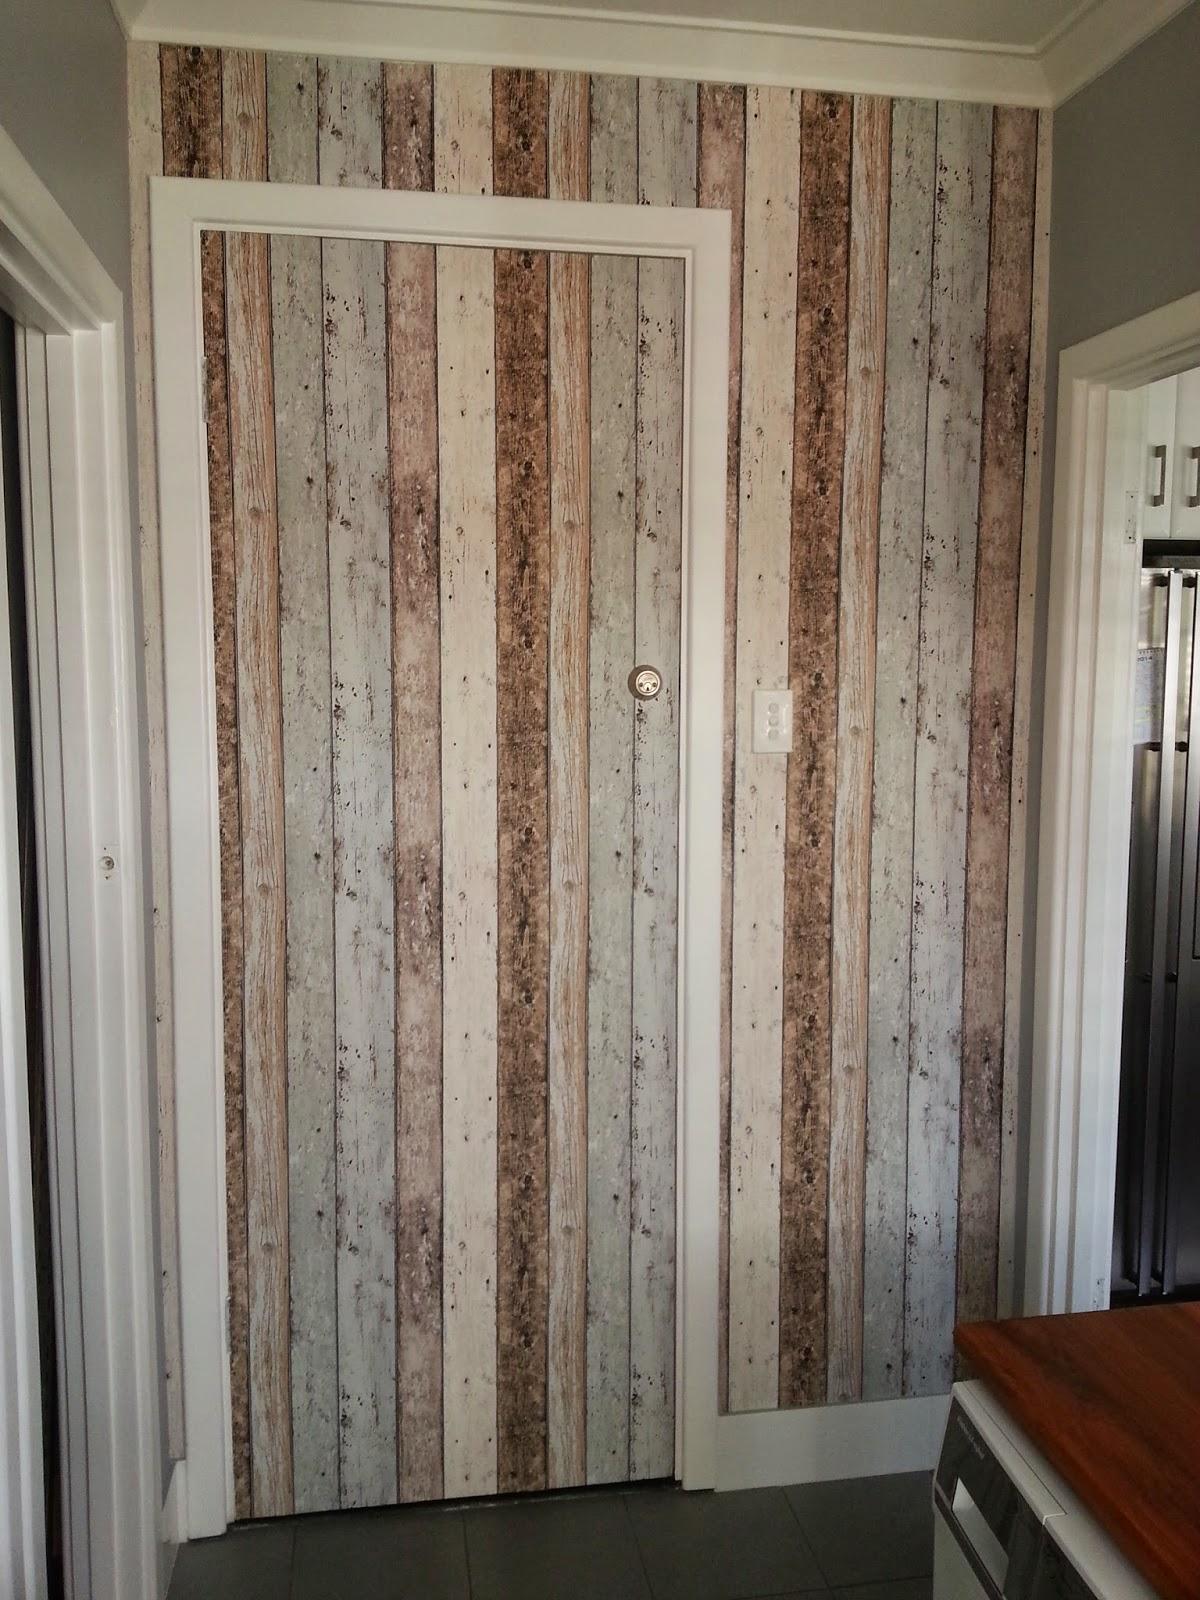 Jarrah Jungle Laundry Renovation How To Wallpaper A Door And Wall